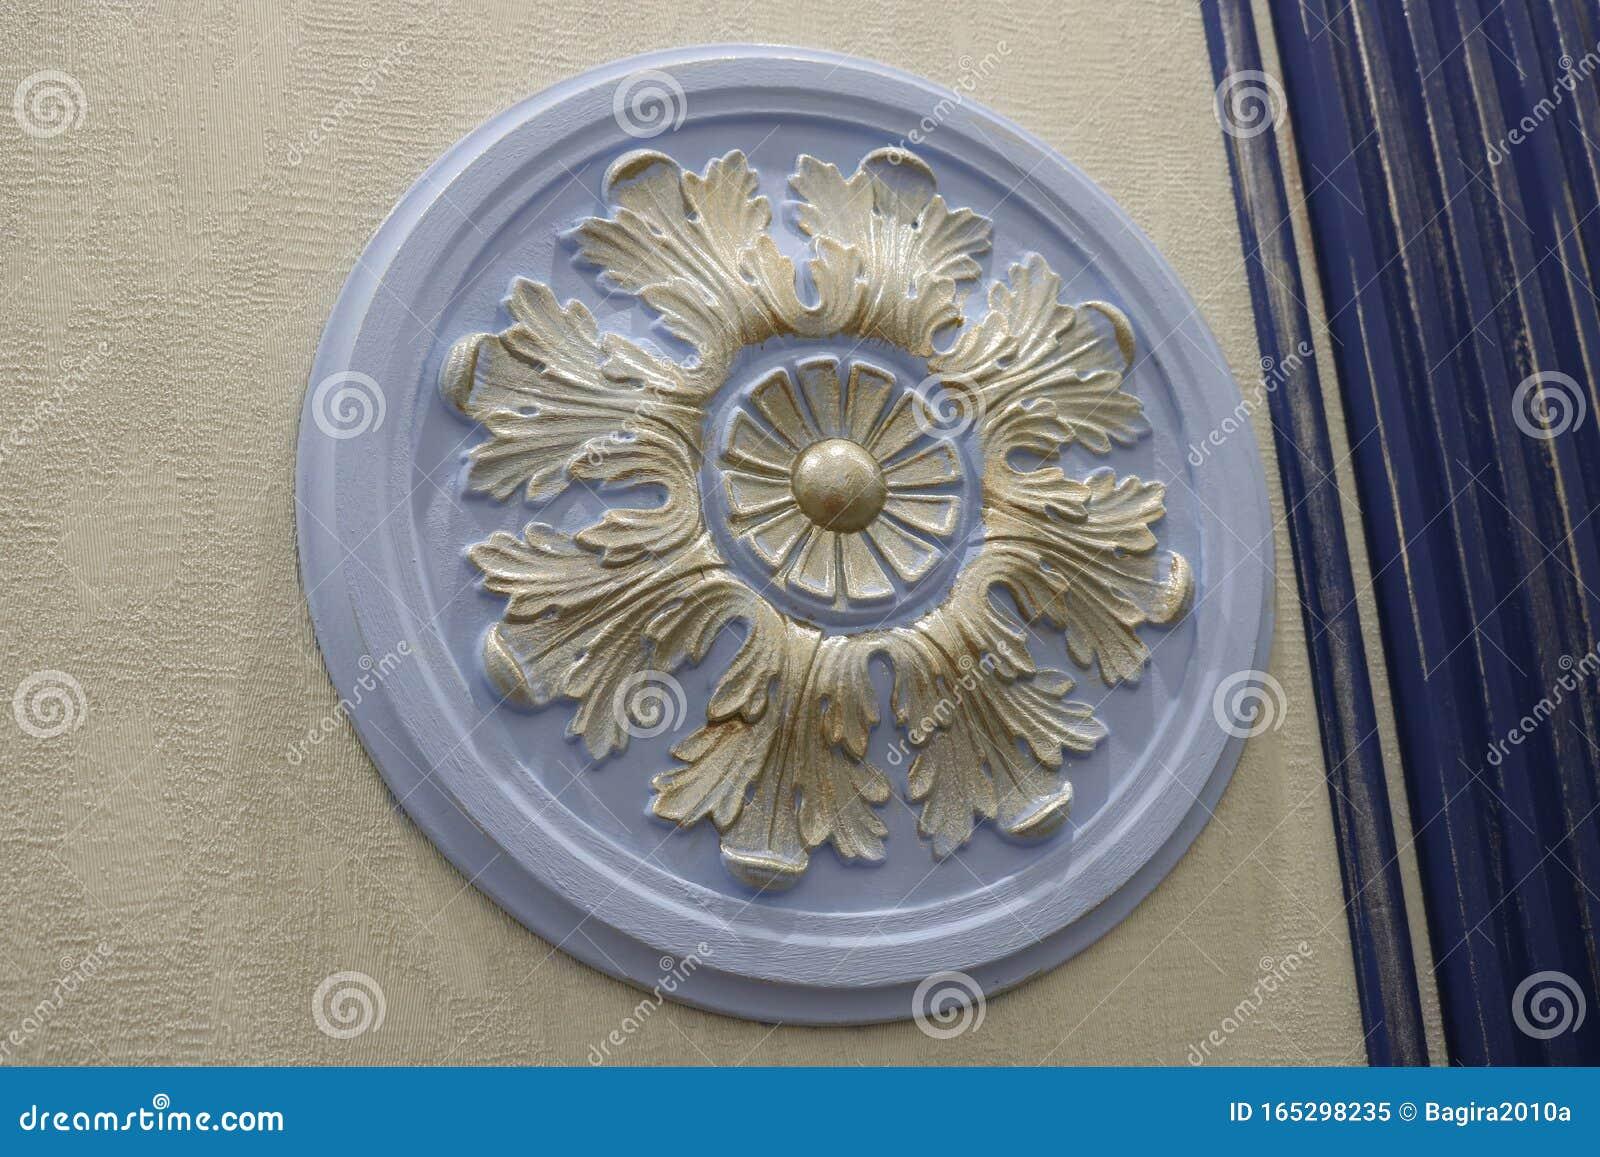 Round Ceramic Wall Decor Element In Retro Style Stock Image Image Of Retro Wall 165298235